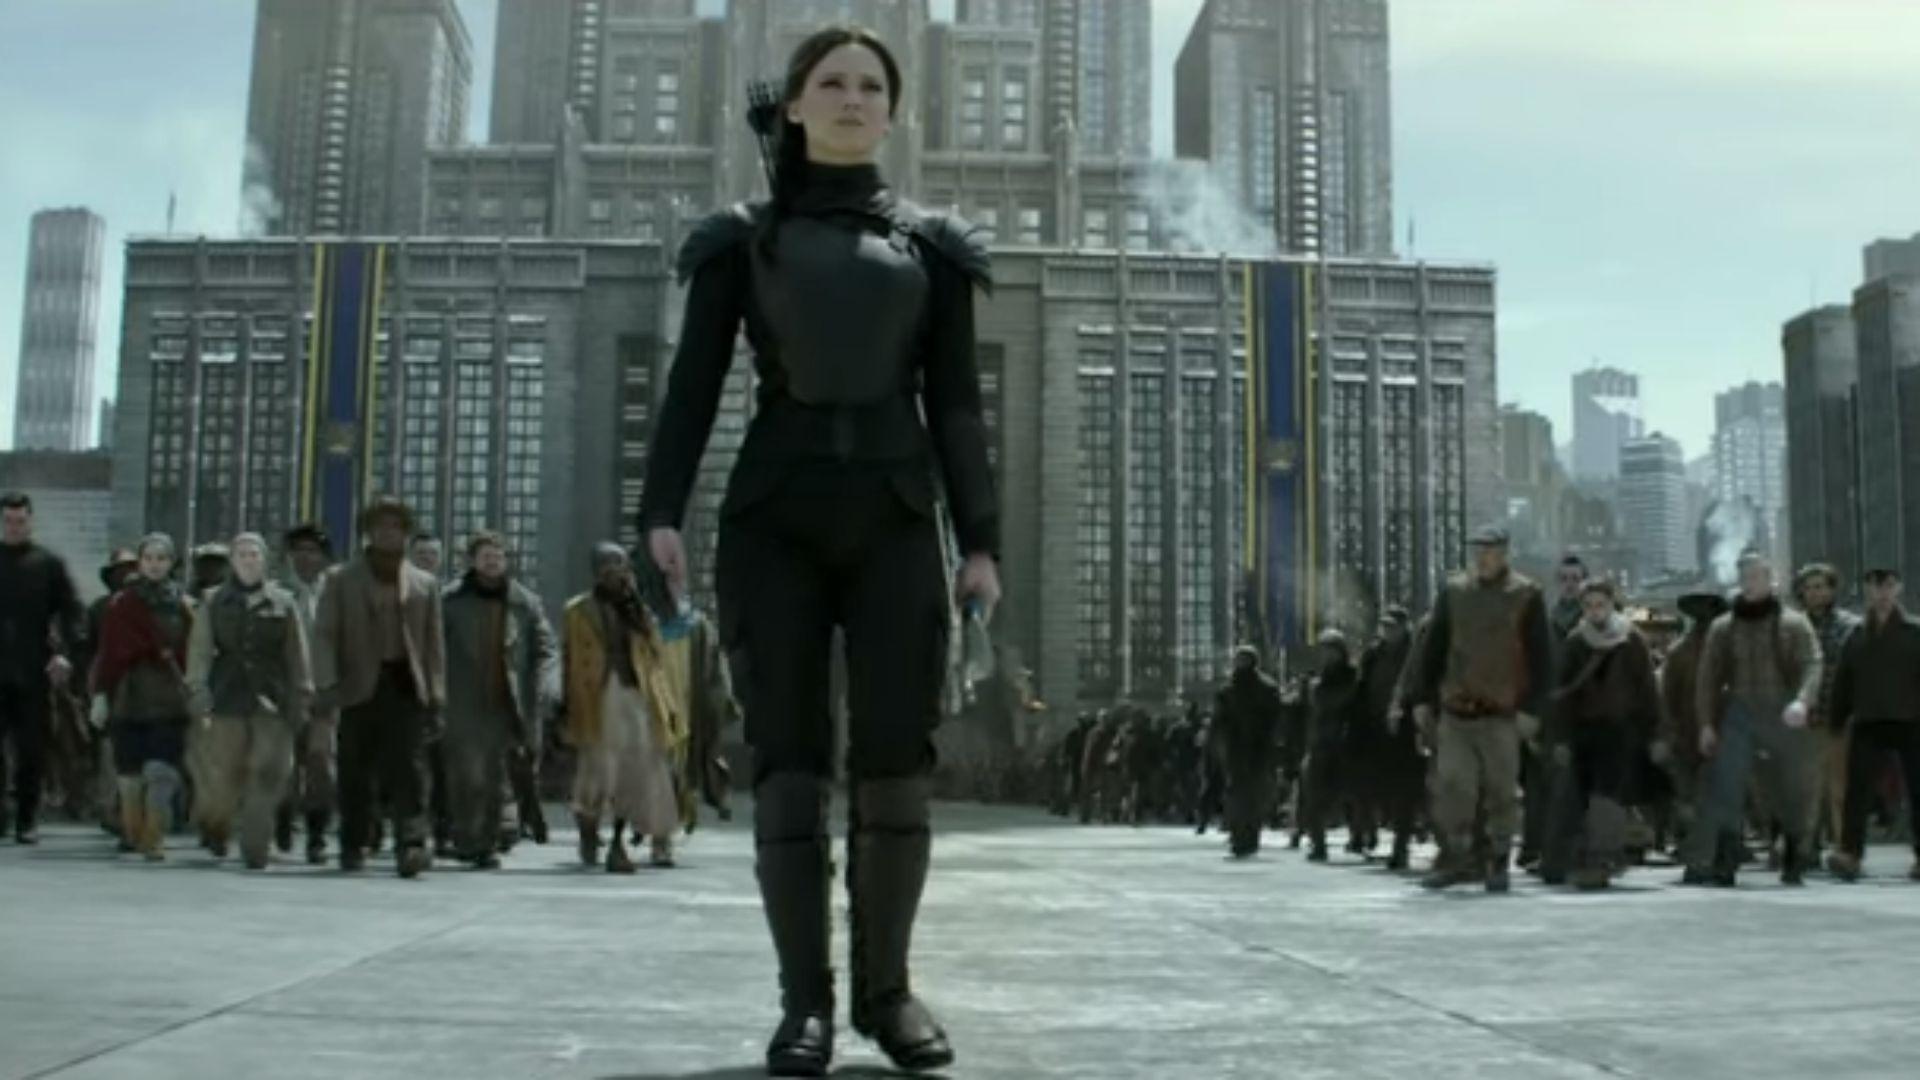 The Hunger Games: Mockingjay Part 2 teaser